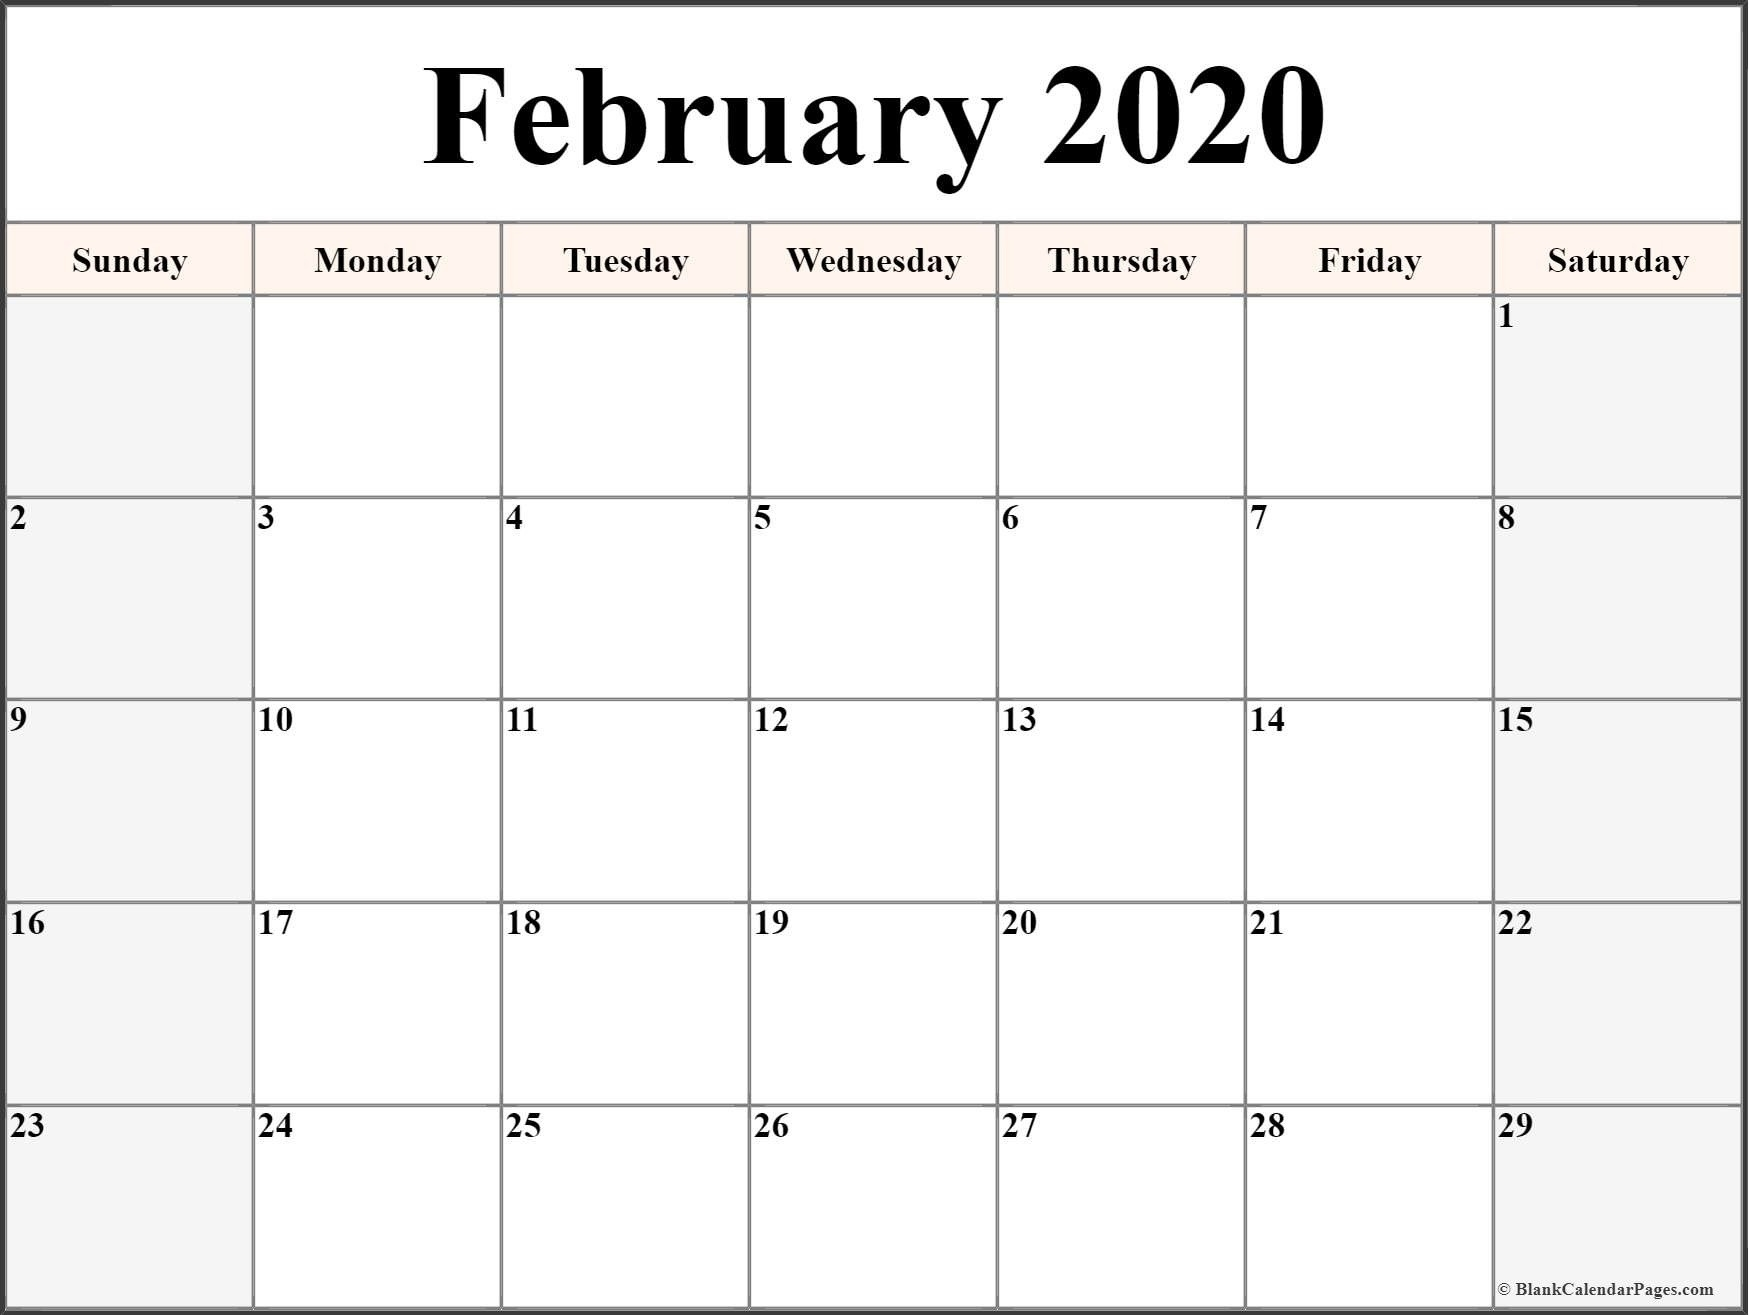 Calendar 2020 Canada Printable - February 2020 Calendar  Firefighter Calendar 2020 Printable